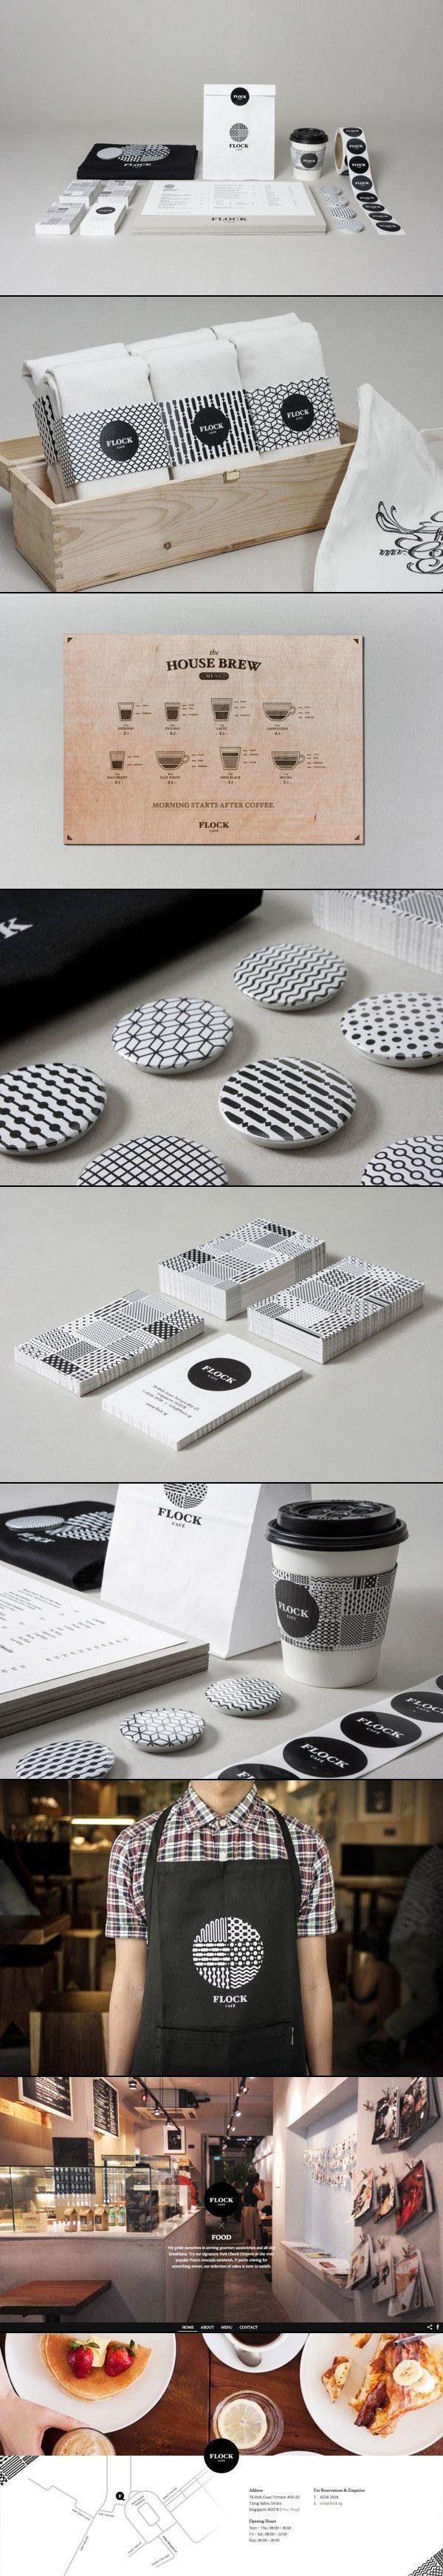 Art Direction and Branding by Kilo Studio for Flock Café #identity #packaging #branding